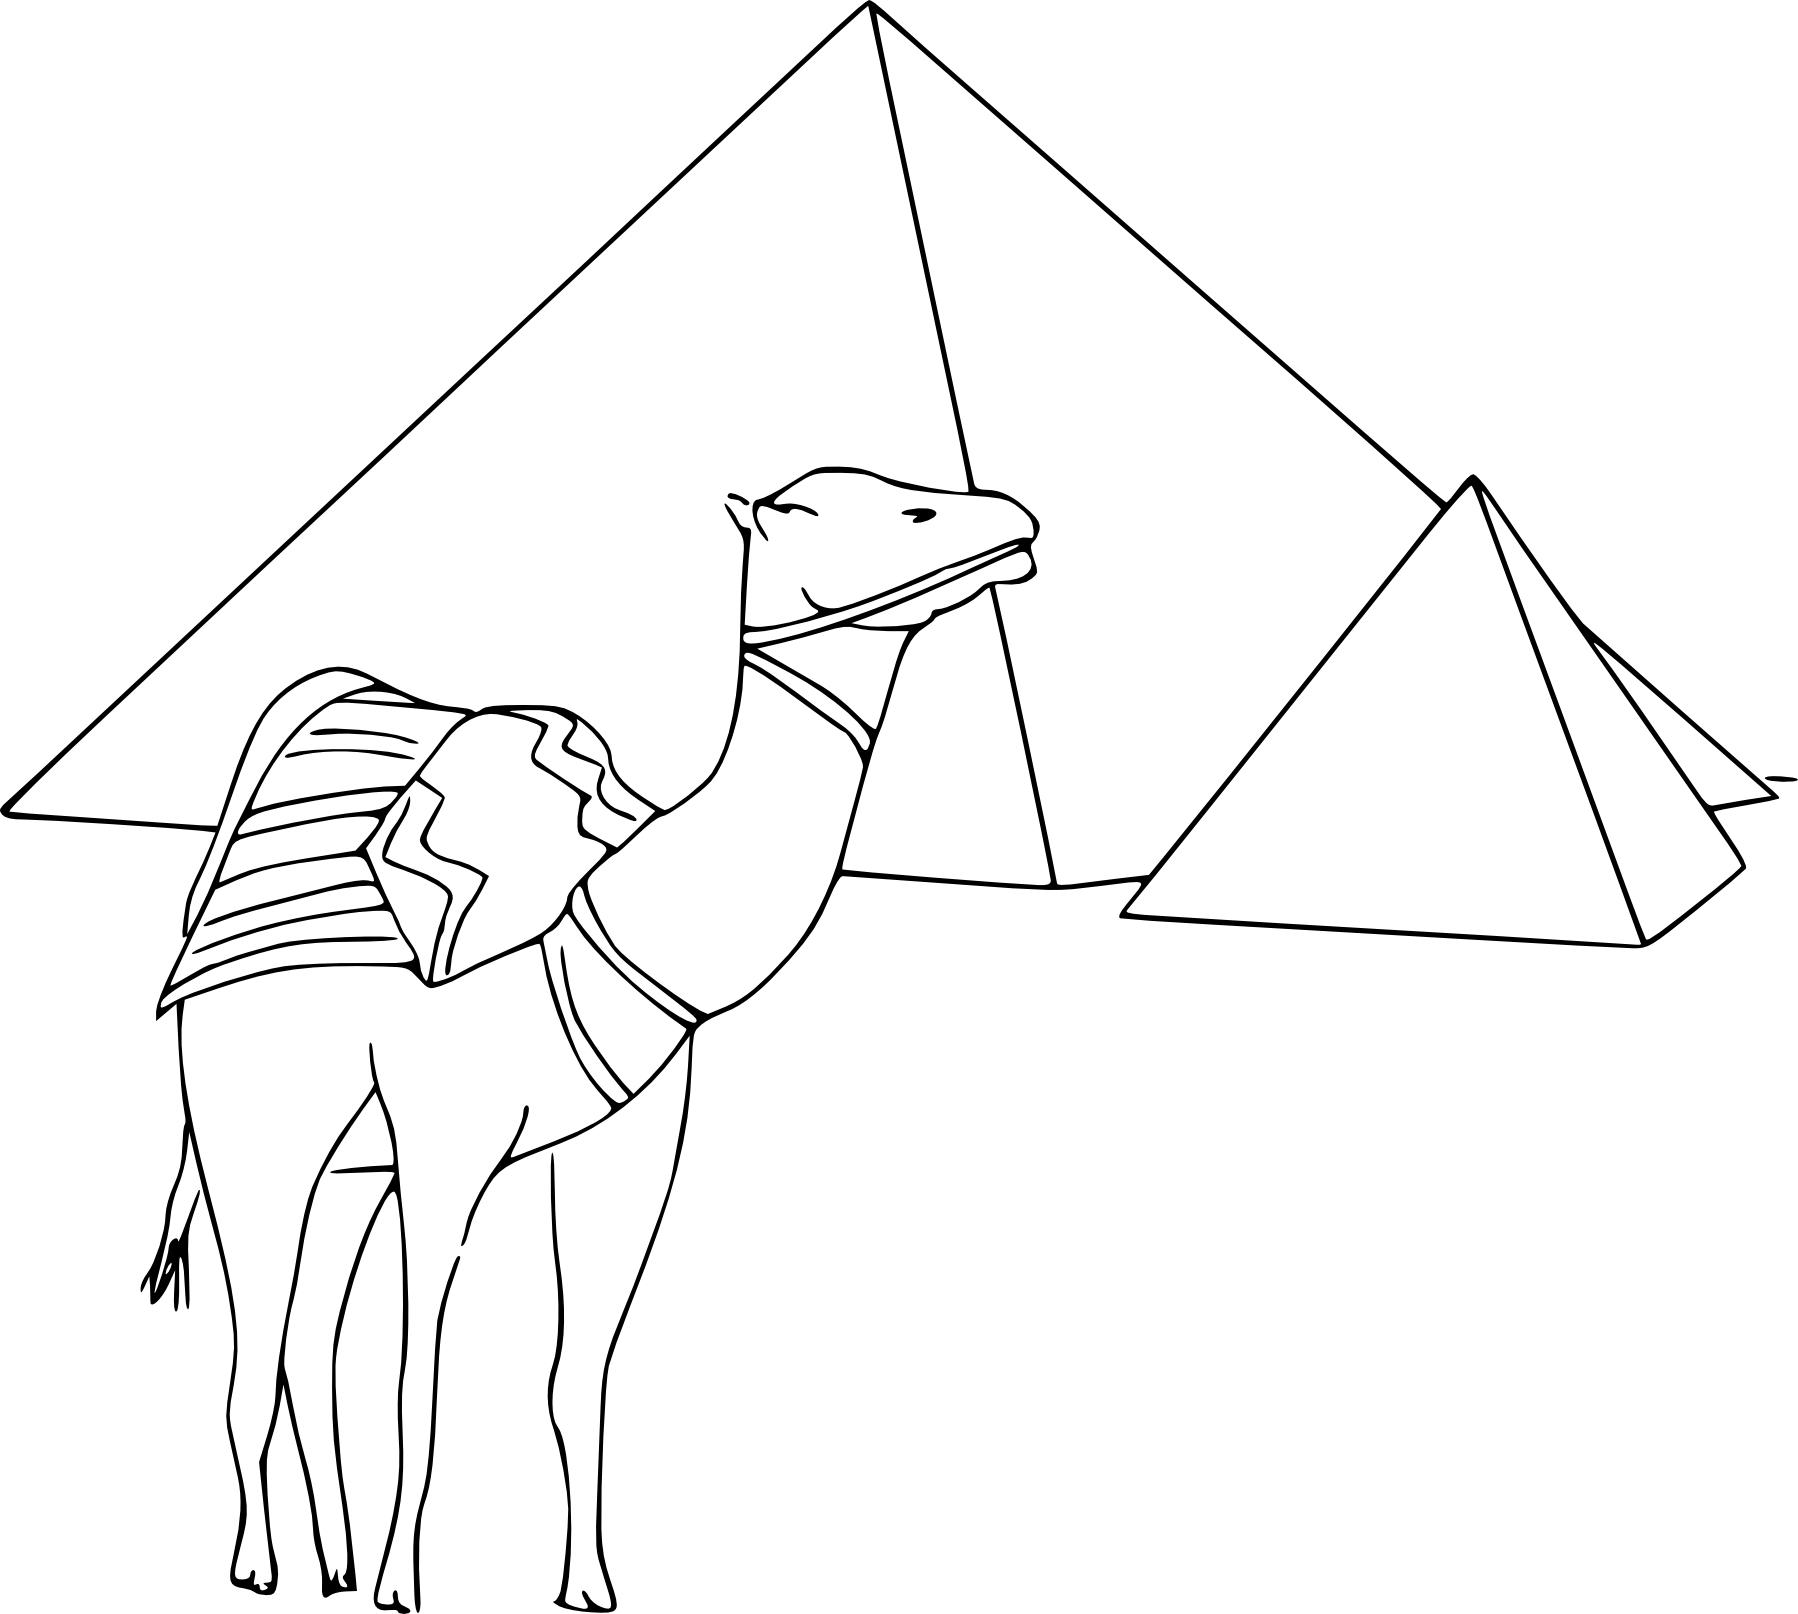 Coloriage pyramides d'Egypte